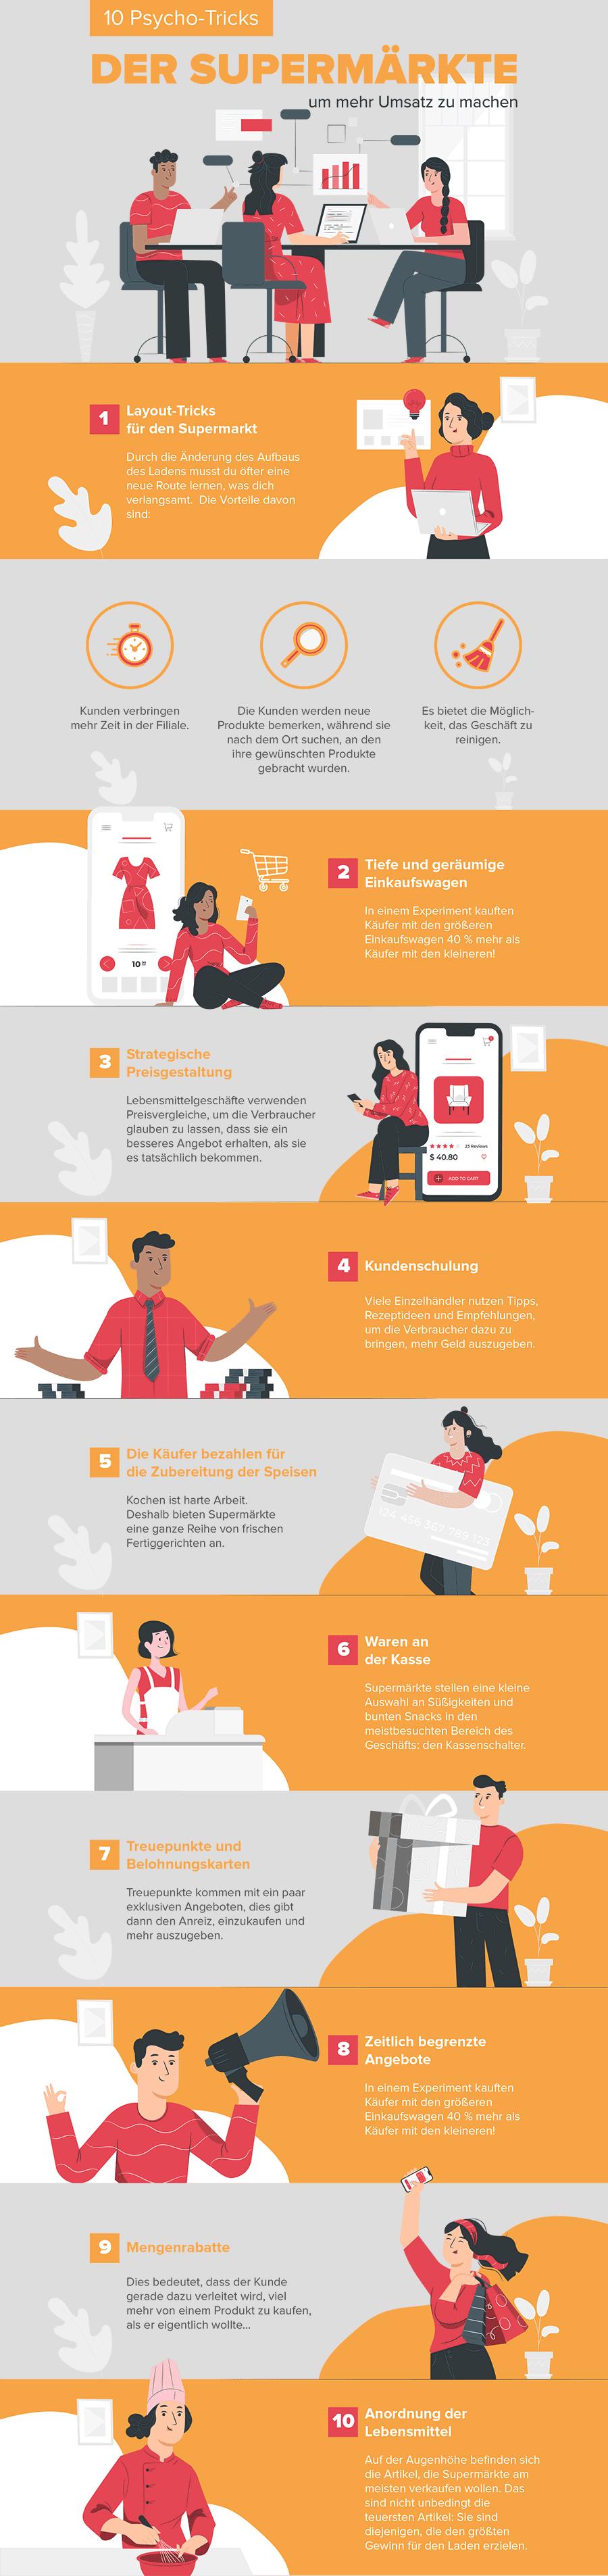 psycho-tricks-supermaerkte-infografik